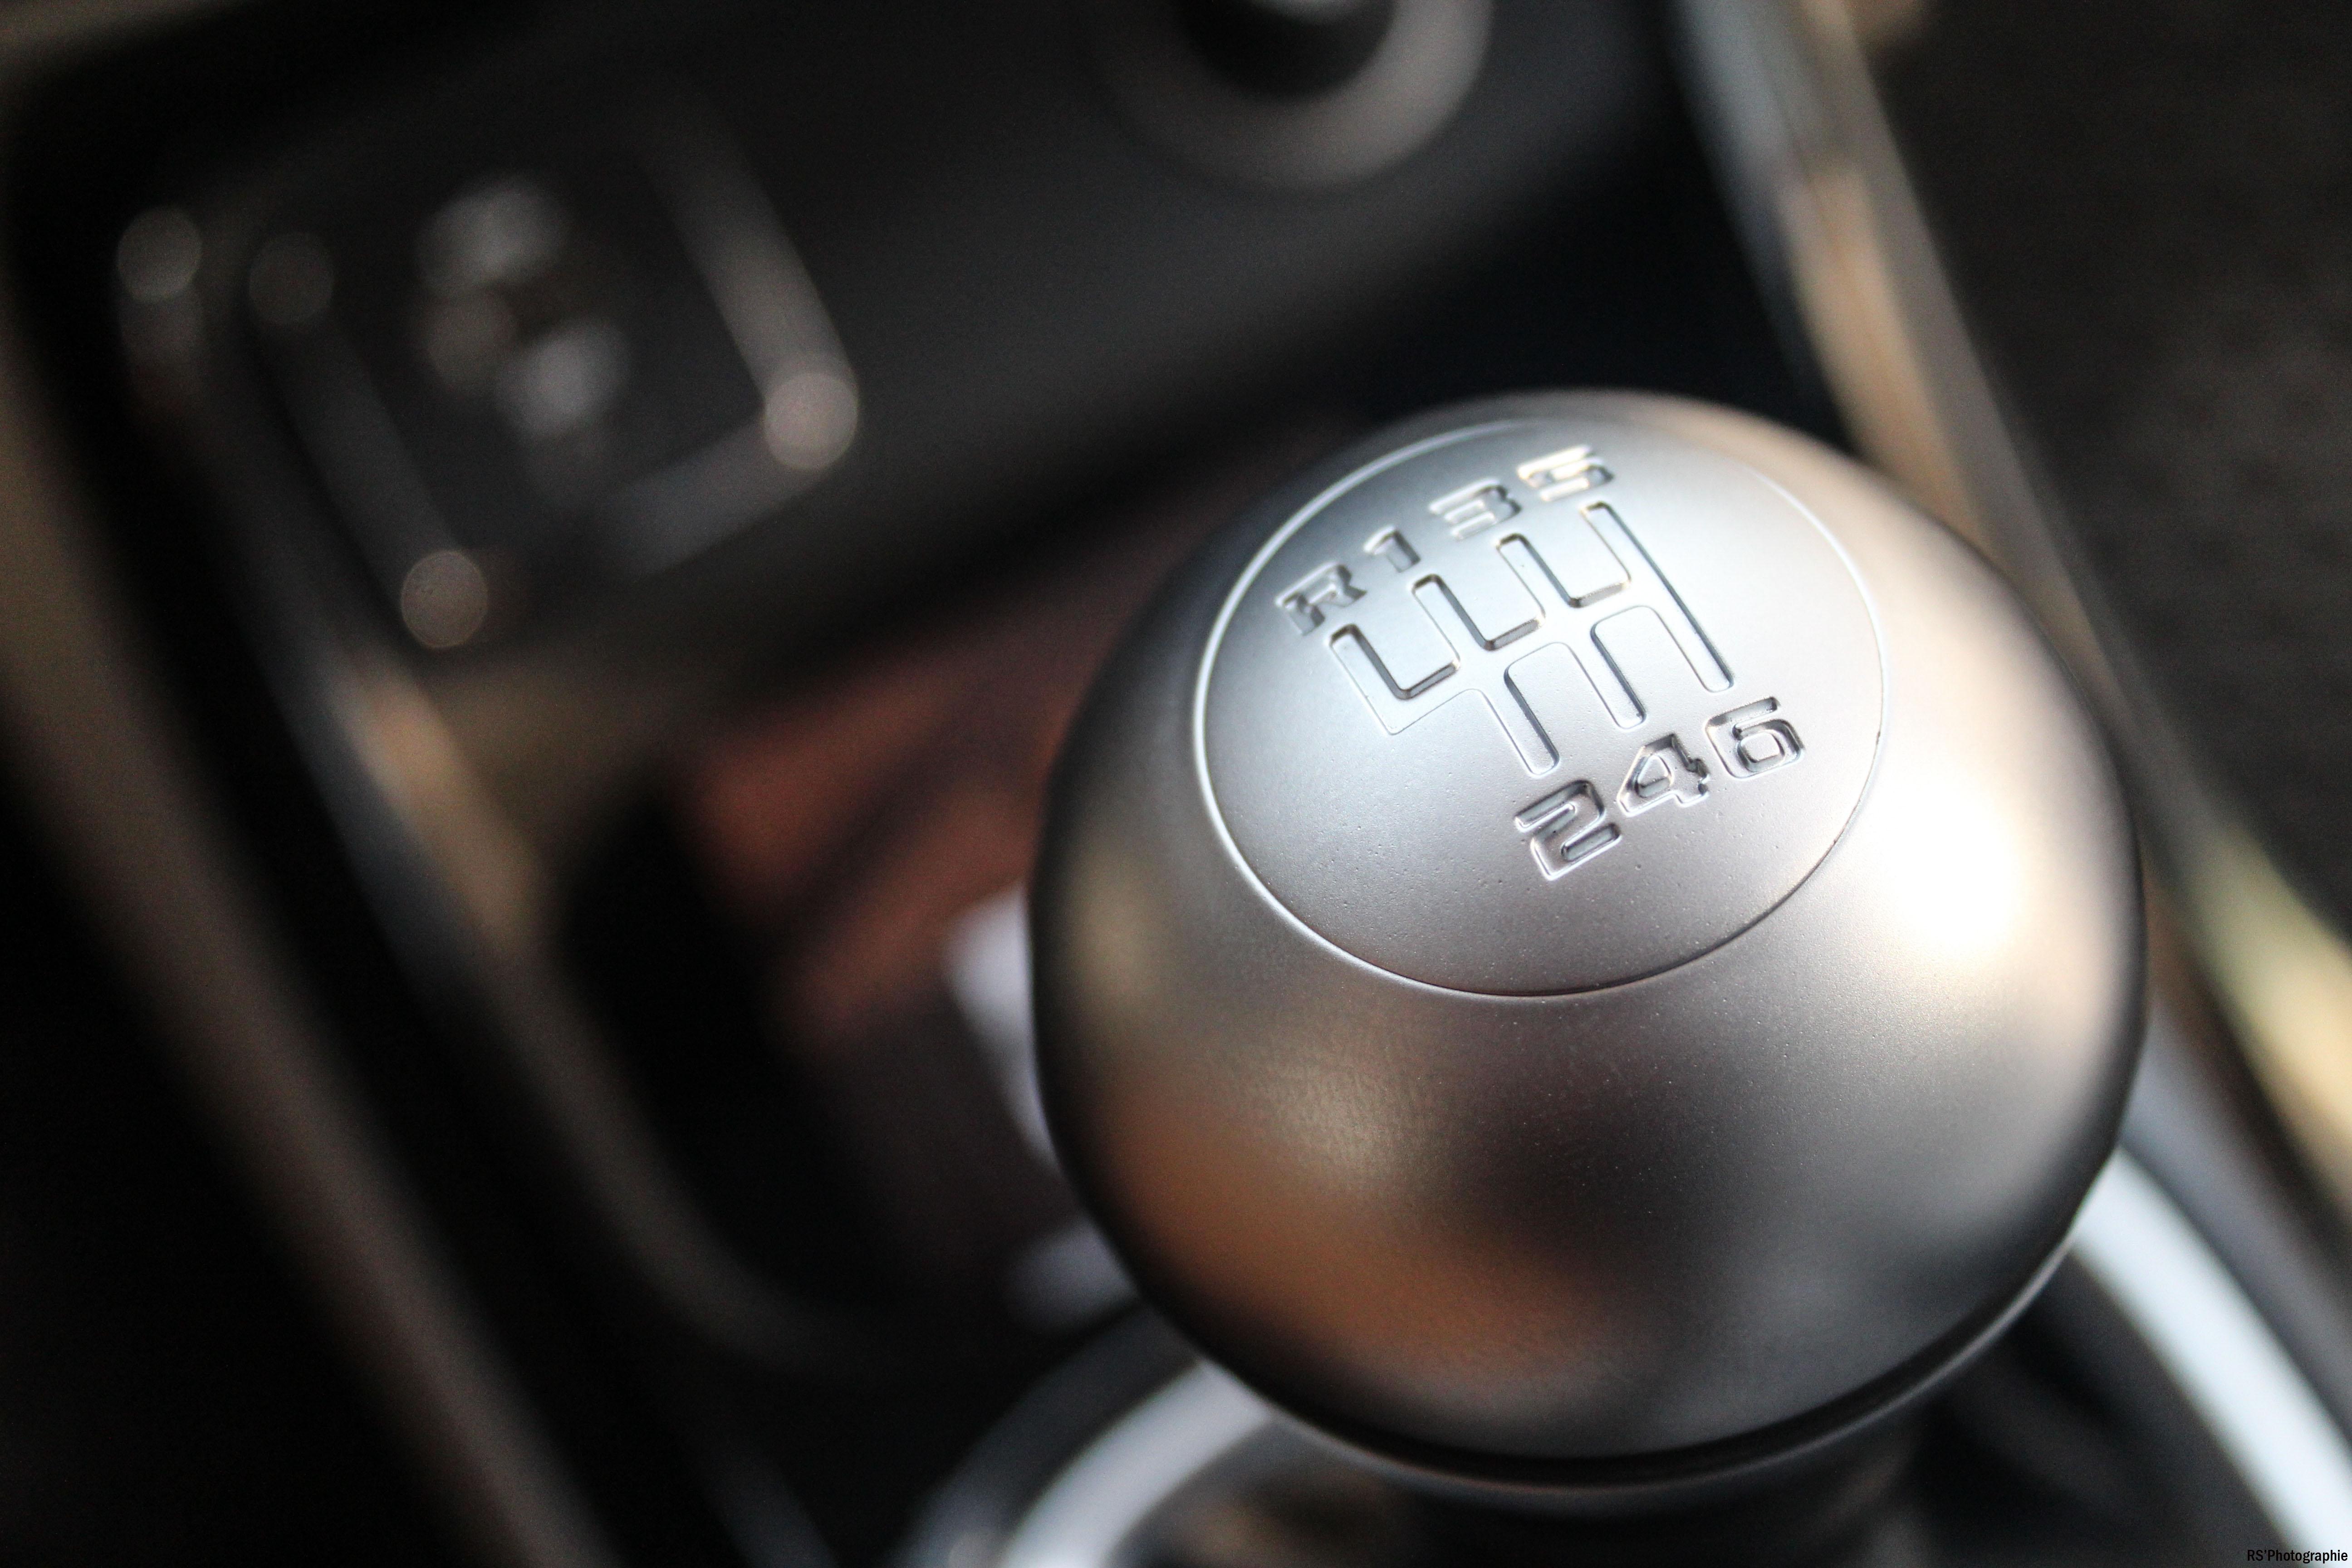 jeepcompass81-jeep-compass-intérieur-onboard-Arnaud Demasier-RSPhotographie